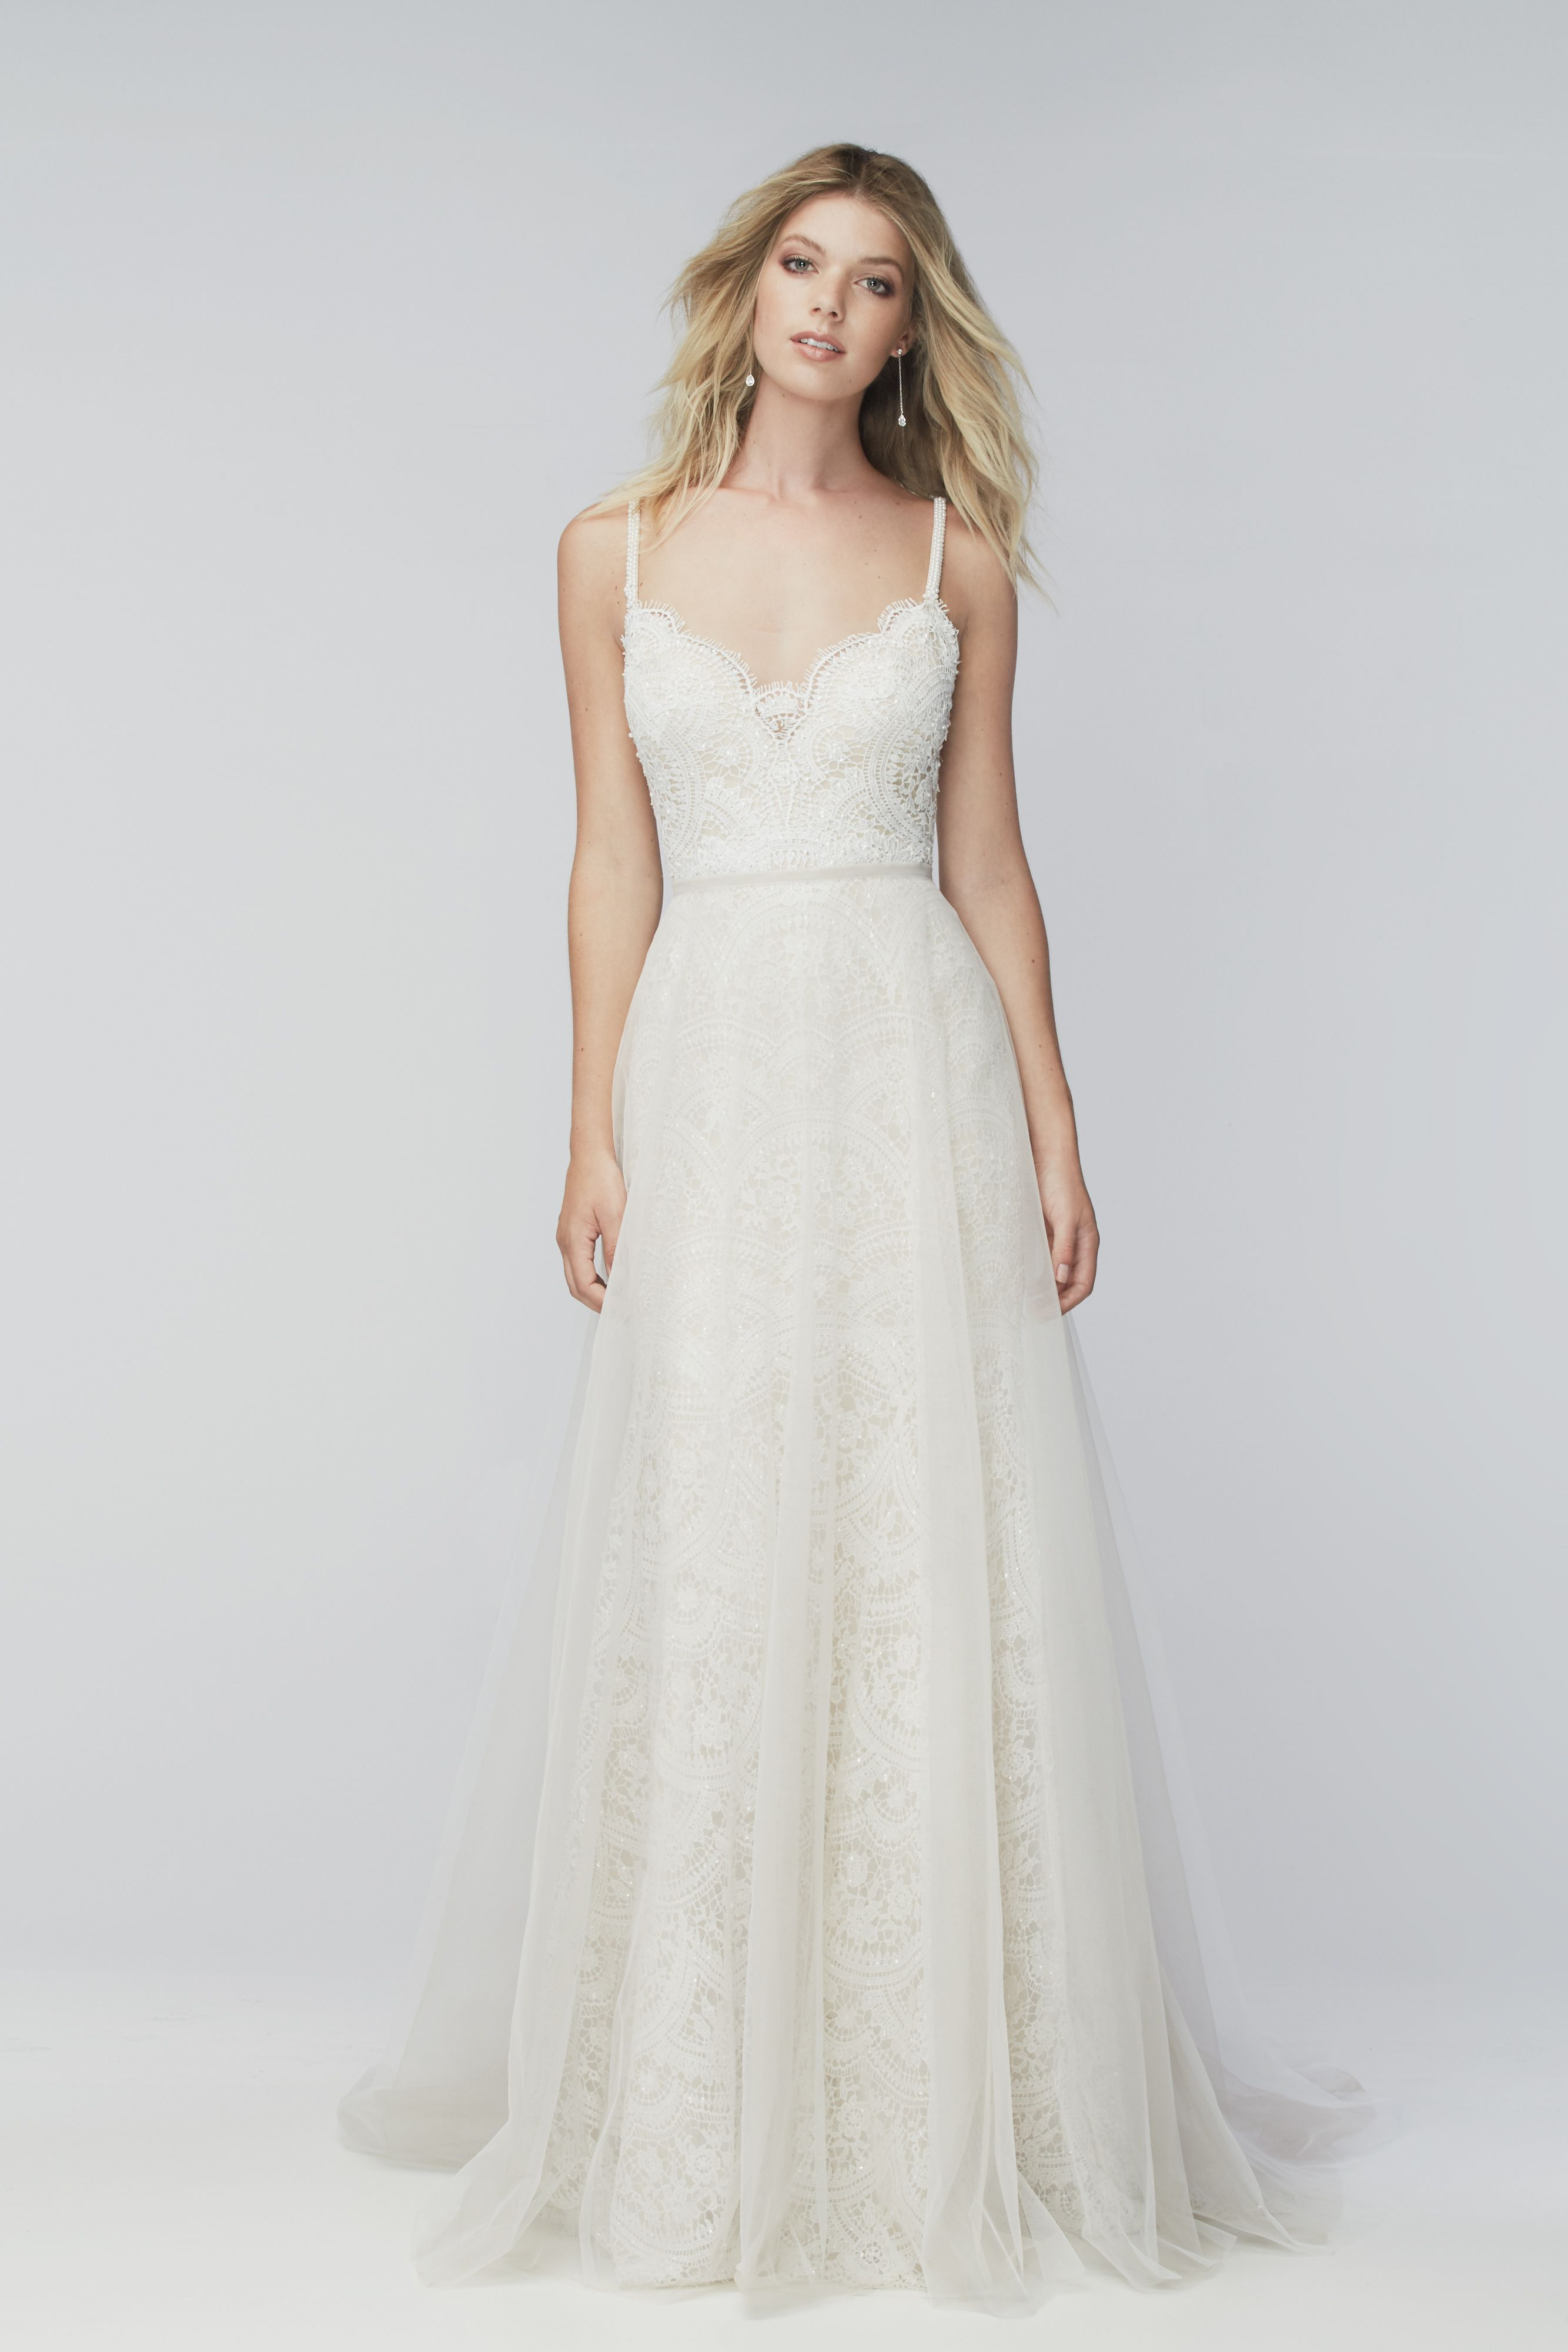 Watterswtoo Elise In Ivory 16153 Windsor Overskirt 16904 Petite Wedding Dress Petite Bride Wedding Dresses [ 4000 x 2667 Pixel ]